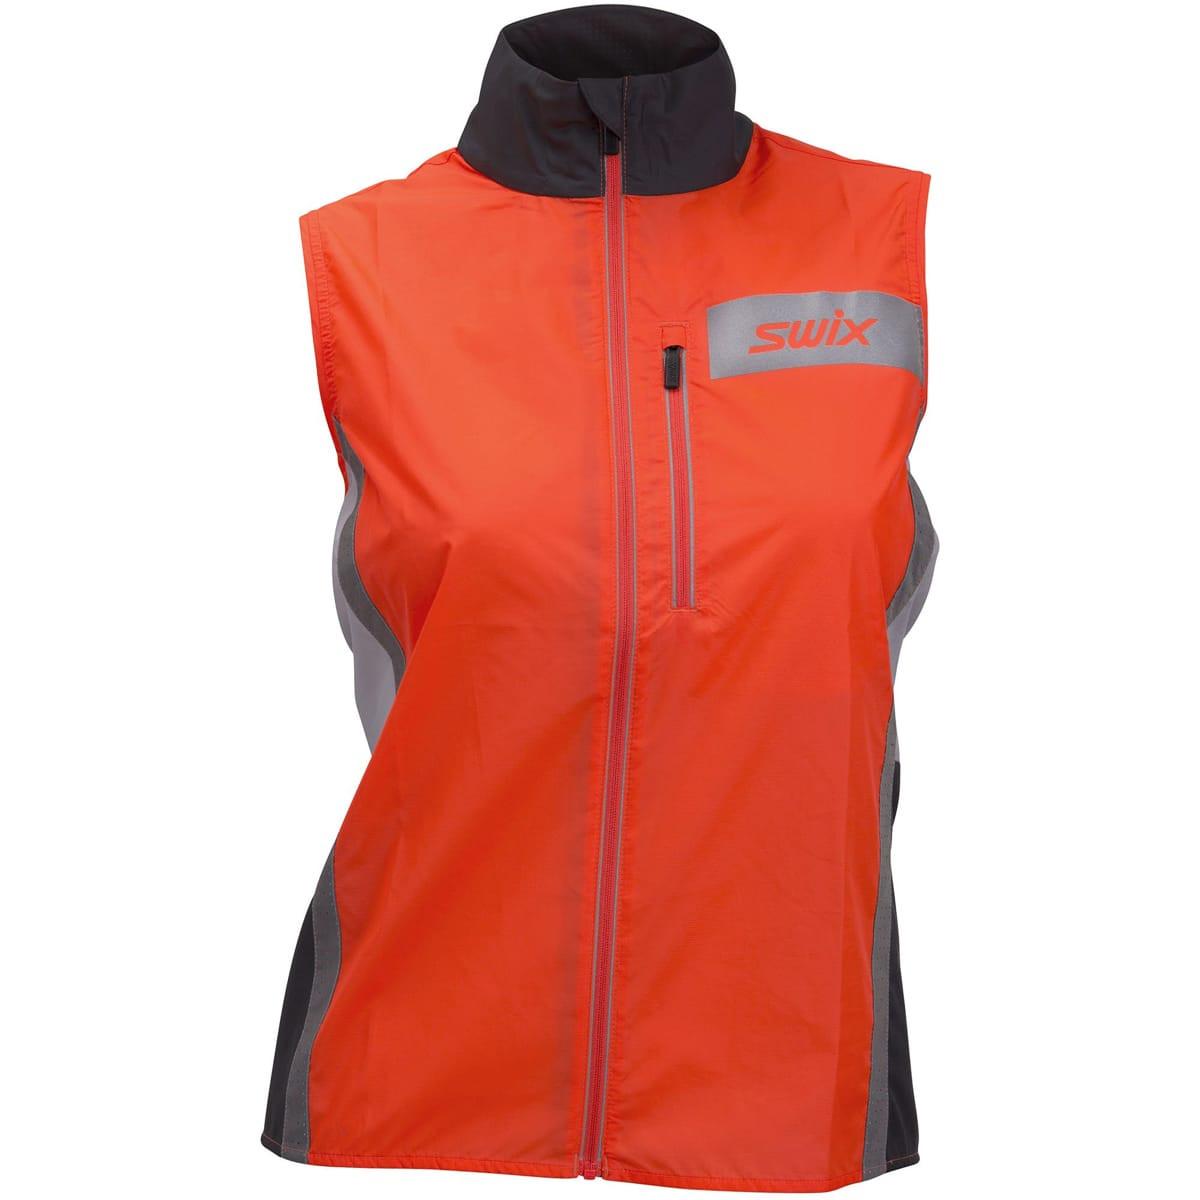 fb7545c9 Swix Radiant Vest Women Neon Red Swix Radiant Vest Women Neon Red ...